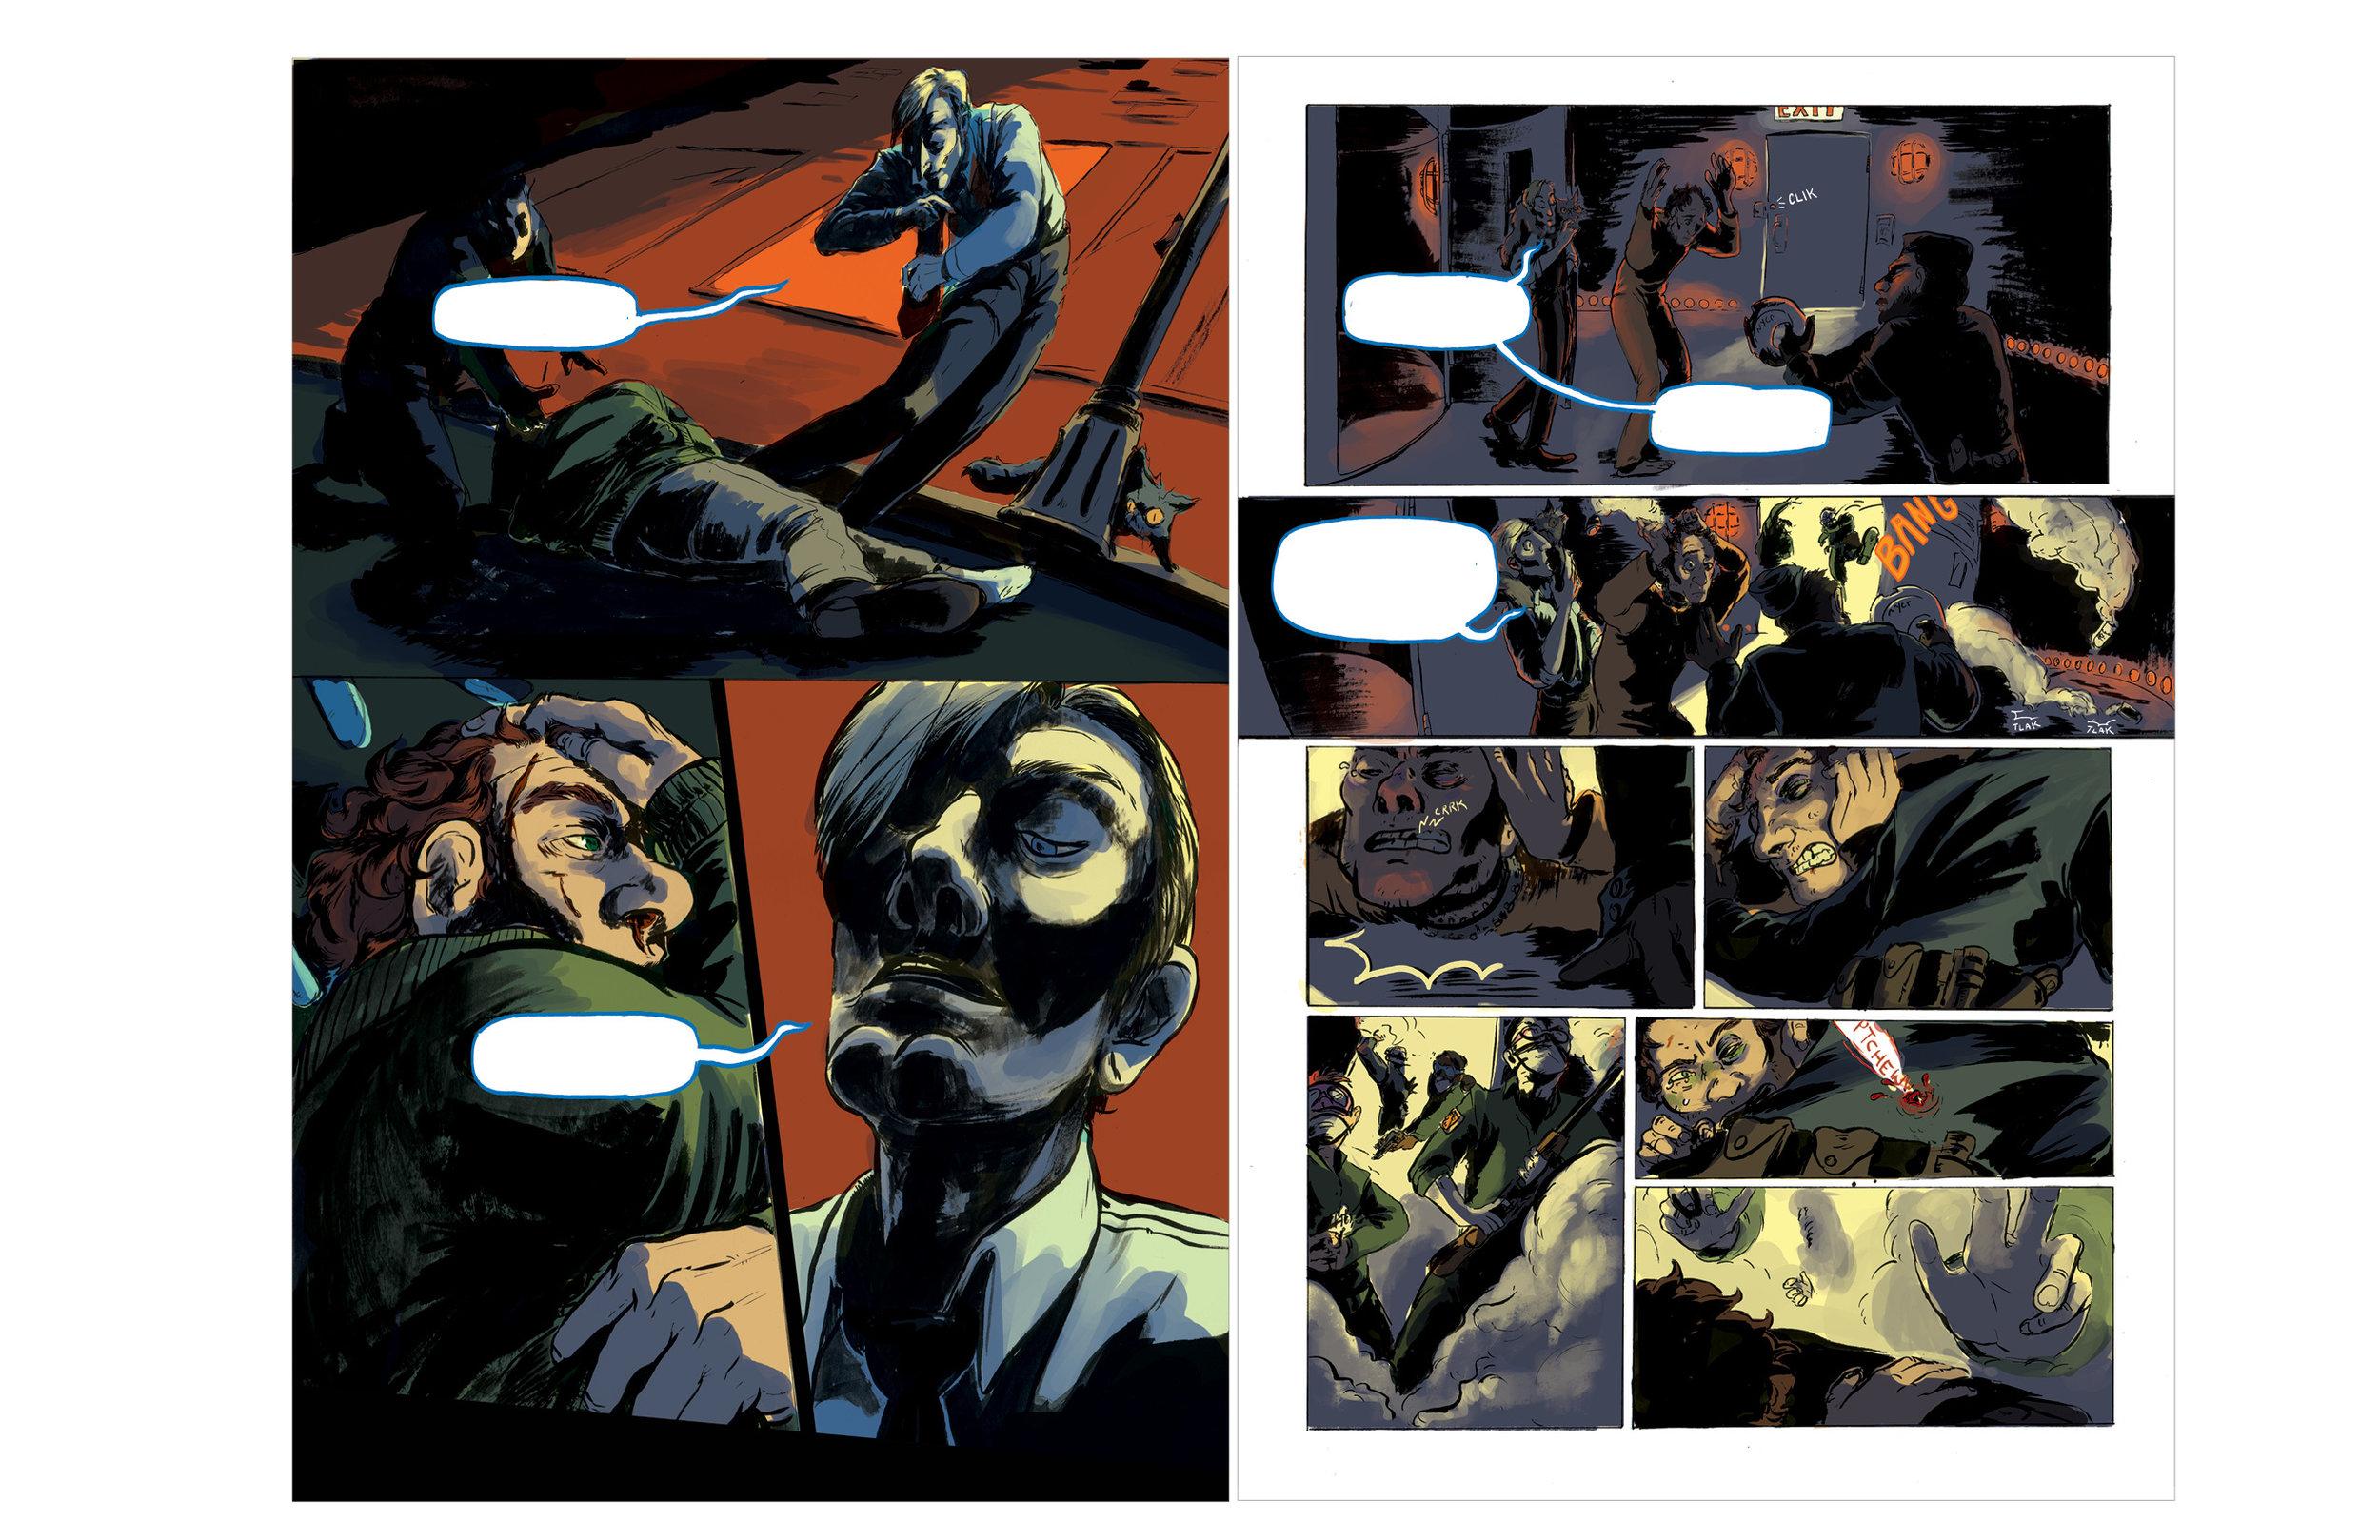 Liana_Sposto_Portfolio_comic_layout4_2550.jpg